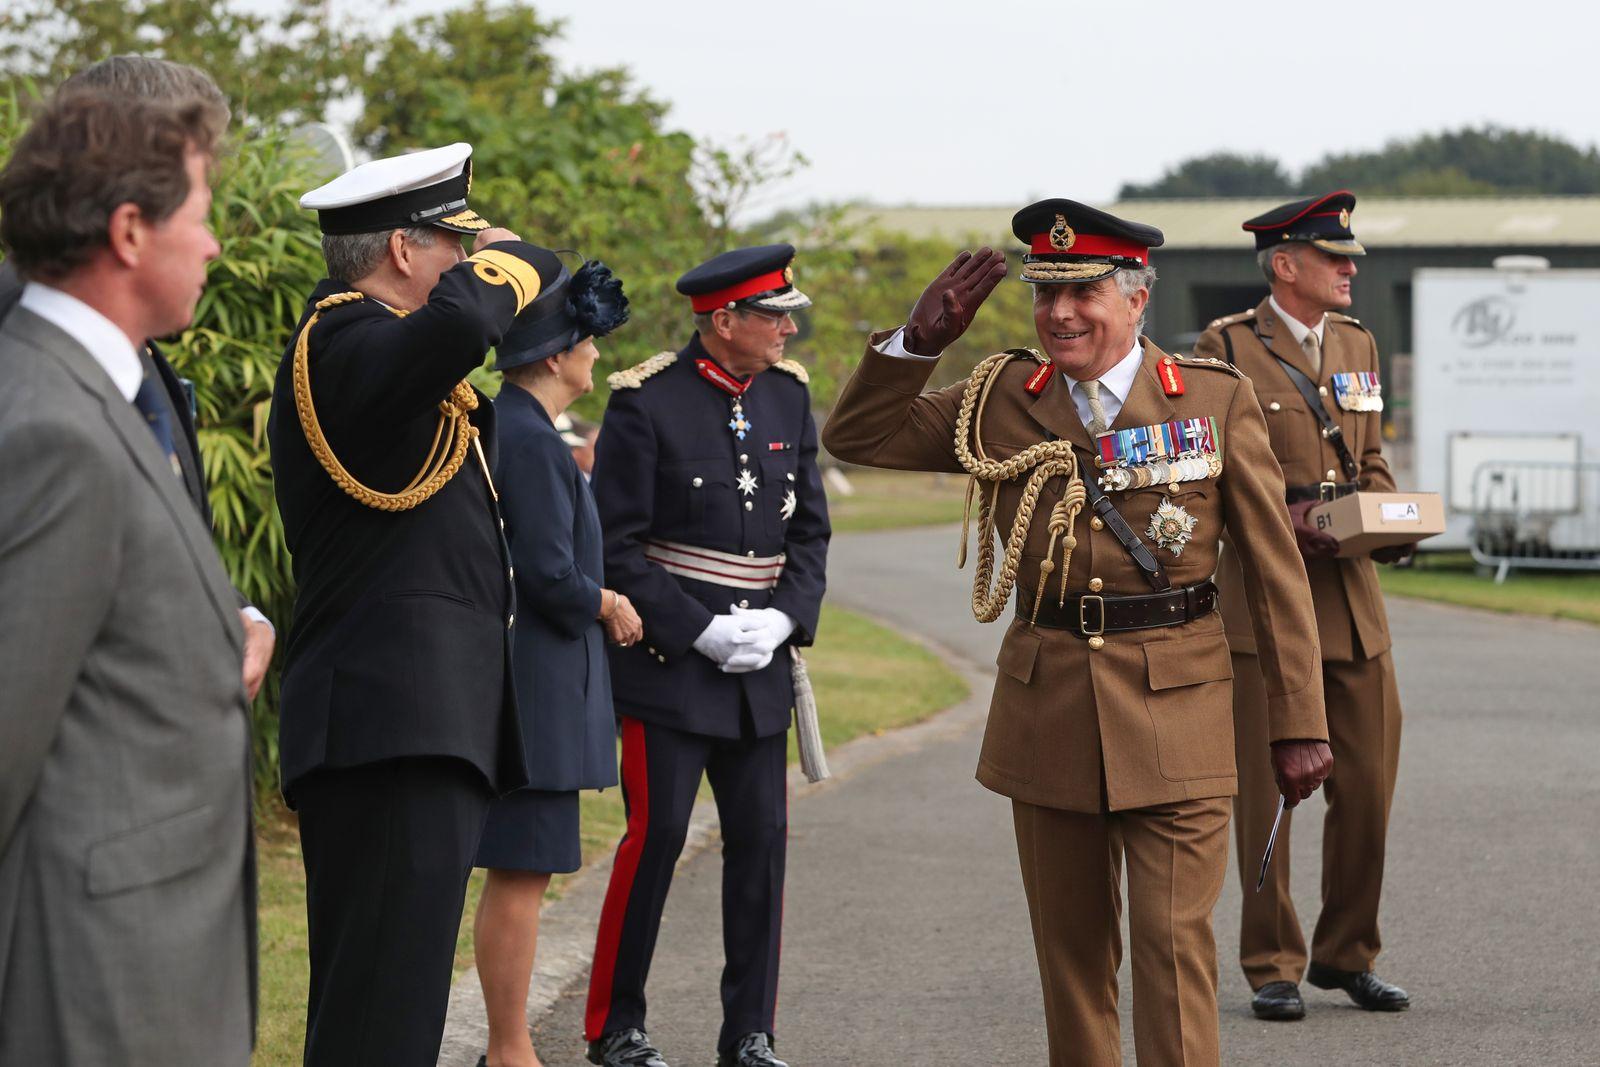 Boris Johnson Lays A Wreath To Commemorate The 75th Anniversary Of VJ Day